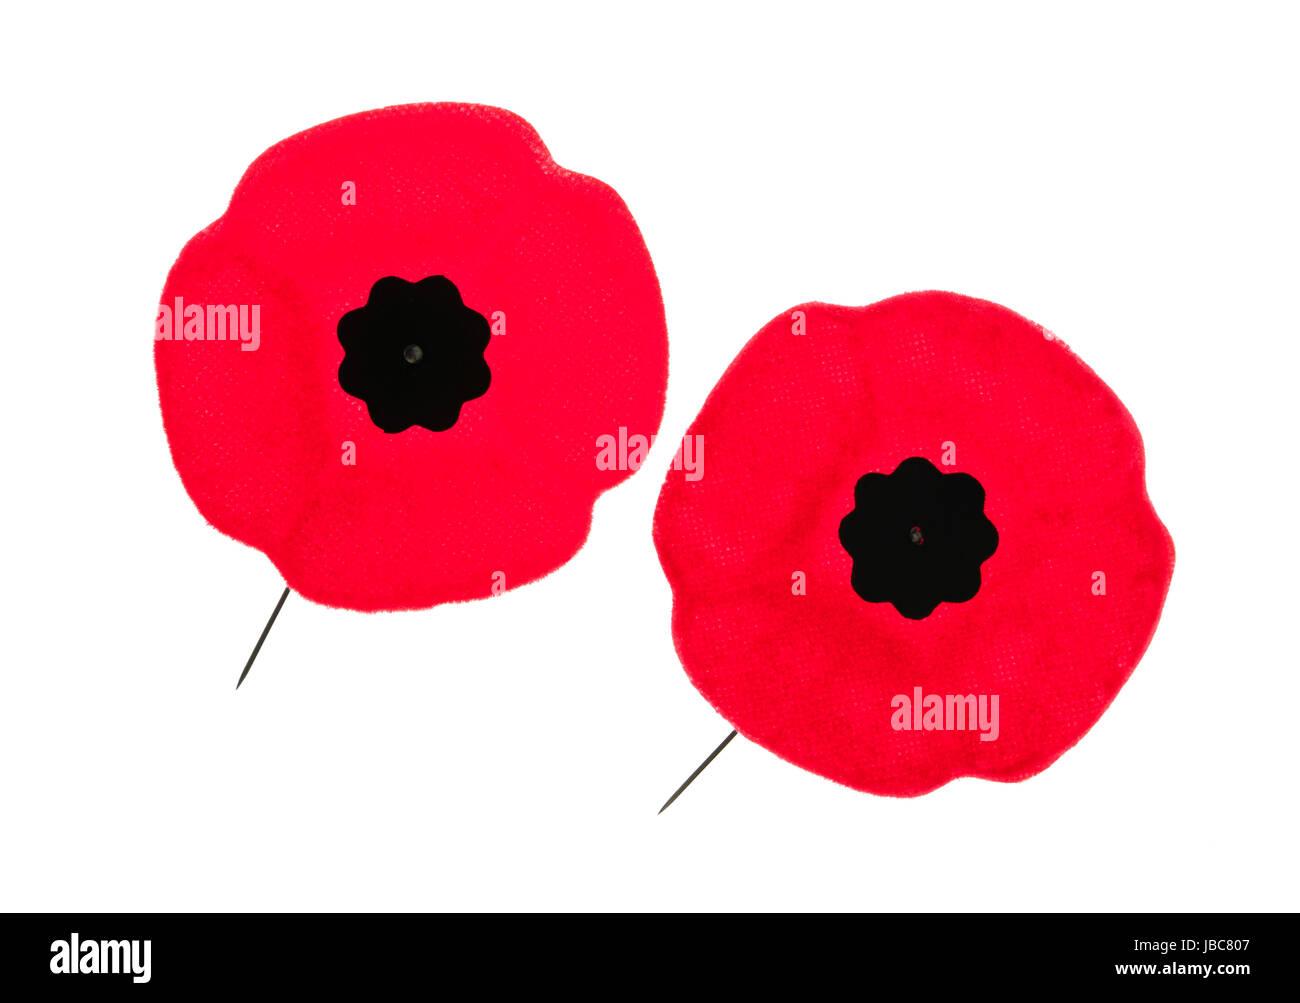 Poppy Pin Stock Photos & Poppy Pin Stock Images - Alamy